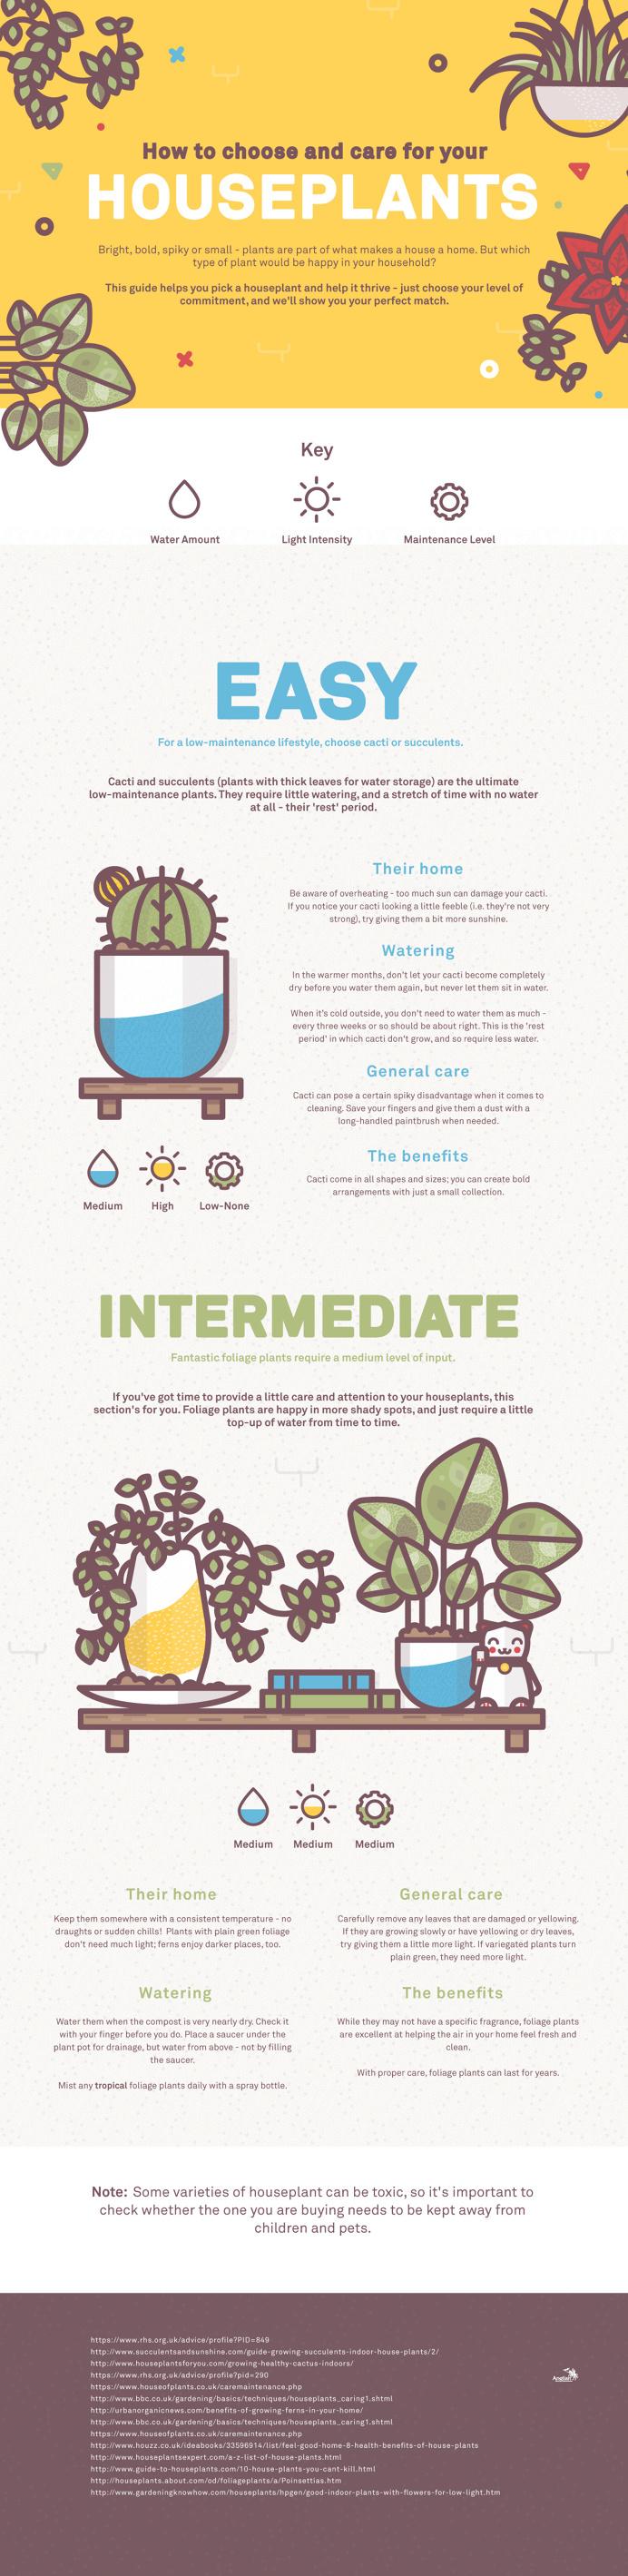 Houseplants infographic illustraiton by Lucas Jubb www.lucasjubb.co.uk